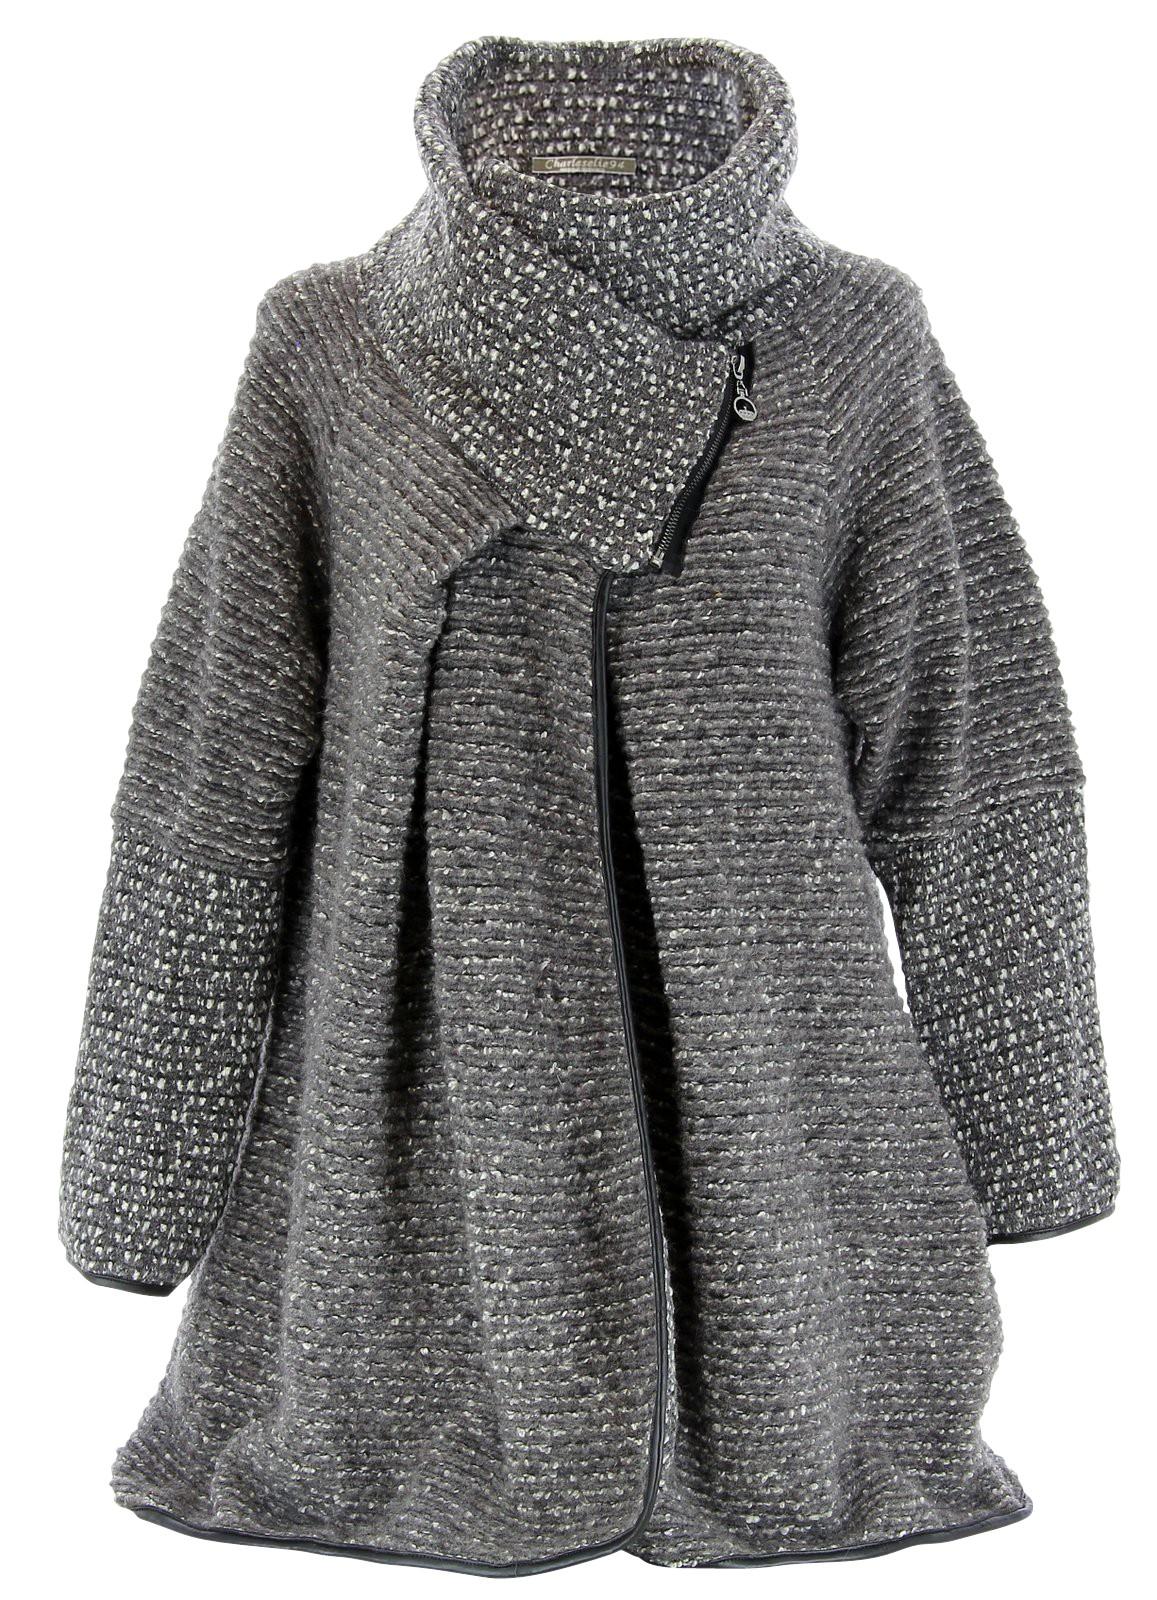 manteau cape femme pas cher grande taille. Black Bedroom Furniture Sets. Home Design Ideas